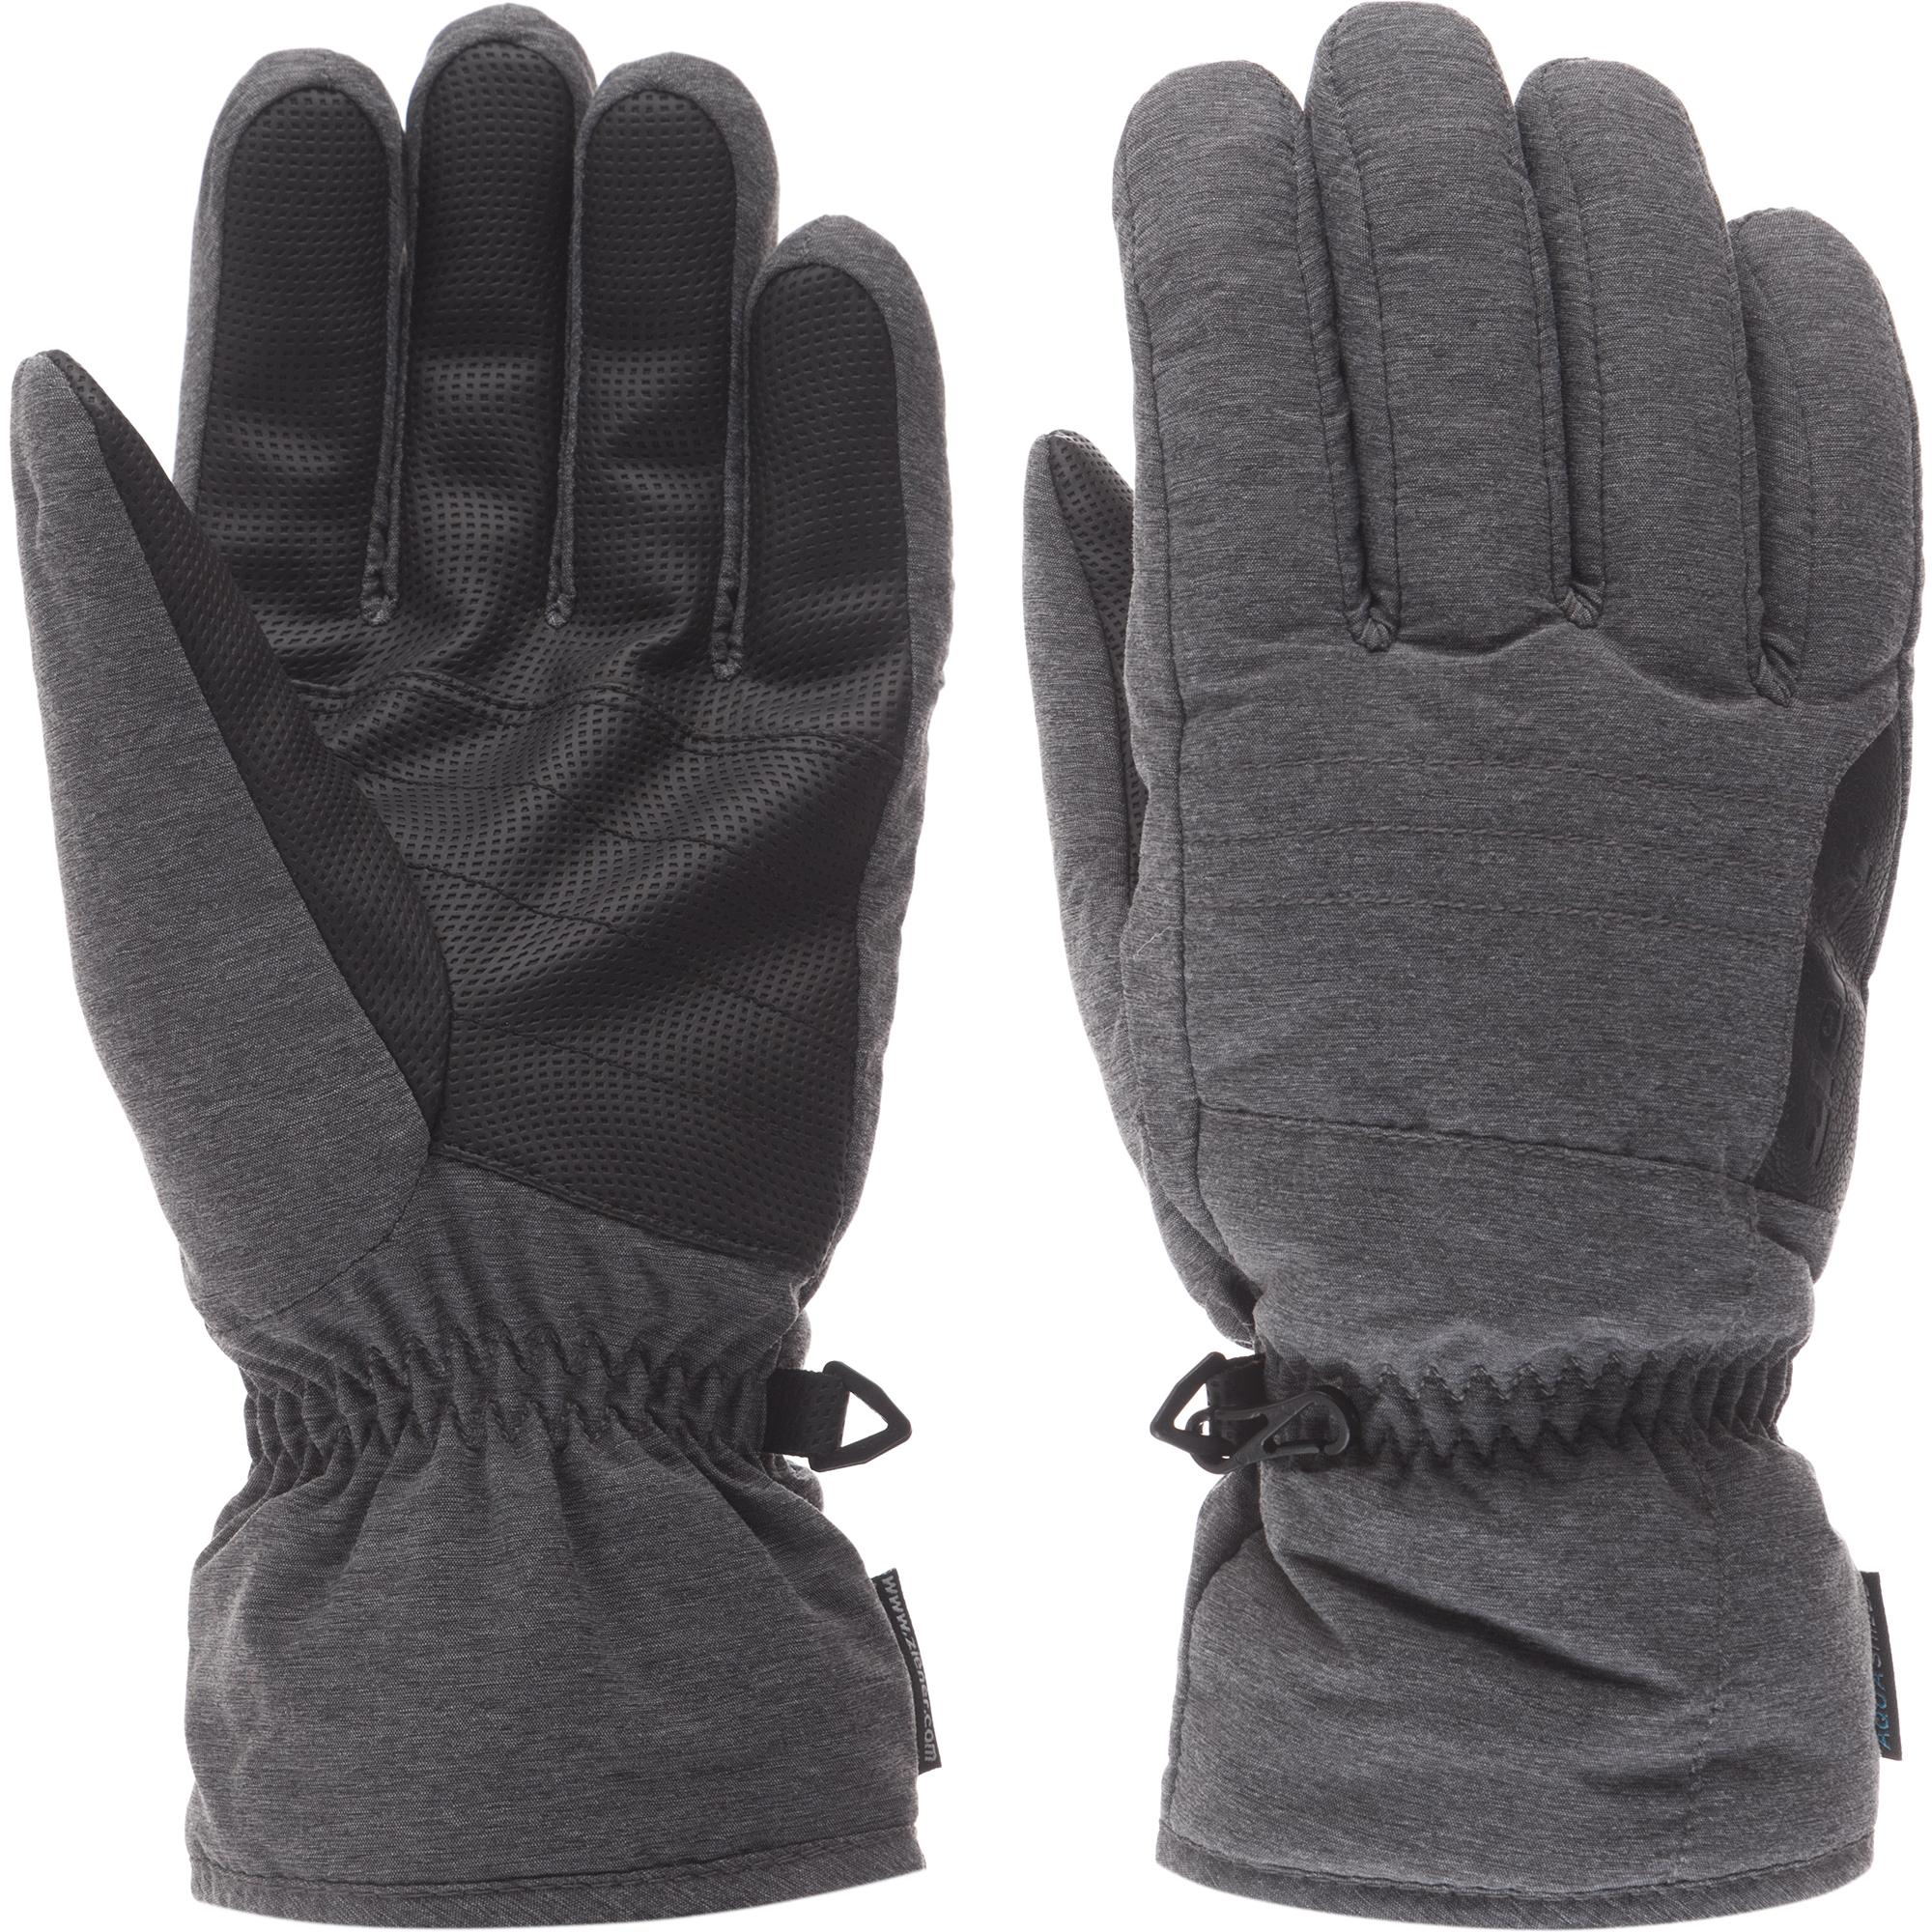 Ziener Перчатки мужские Ziener, размер 10,5 ziener перчатки мужские ziener gliss gtx размер 9